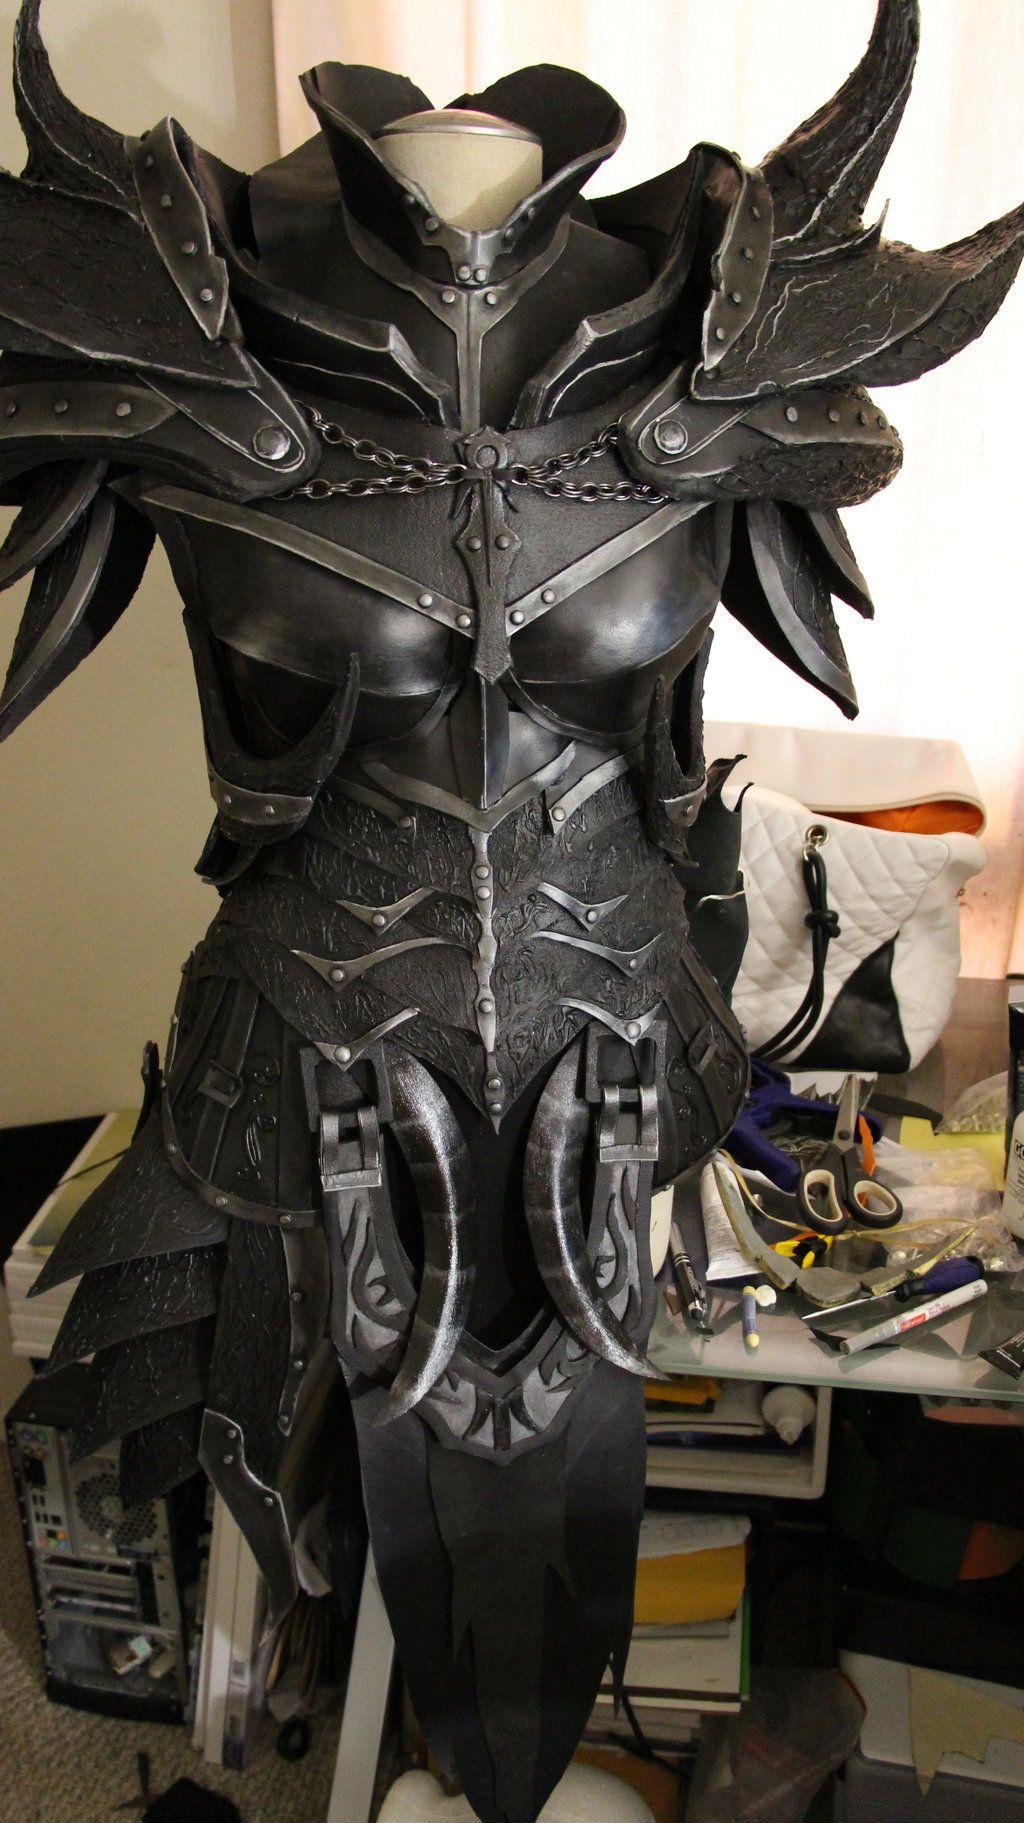 Skyrim Daedric Armor WIP by lsomething.deviantart.com on @DeviantArt